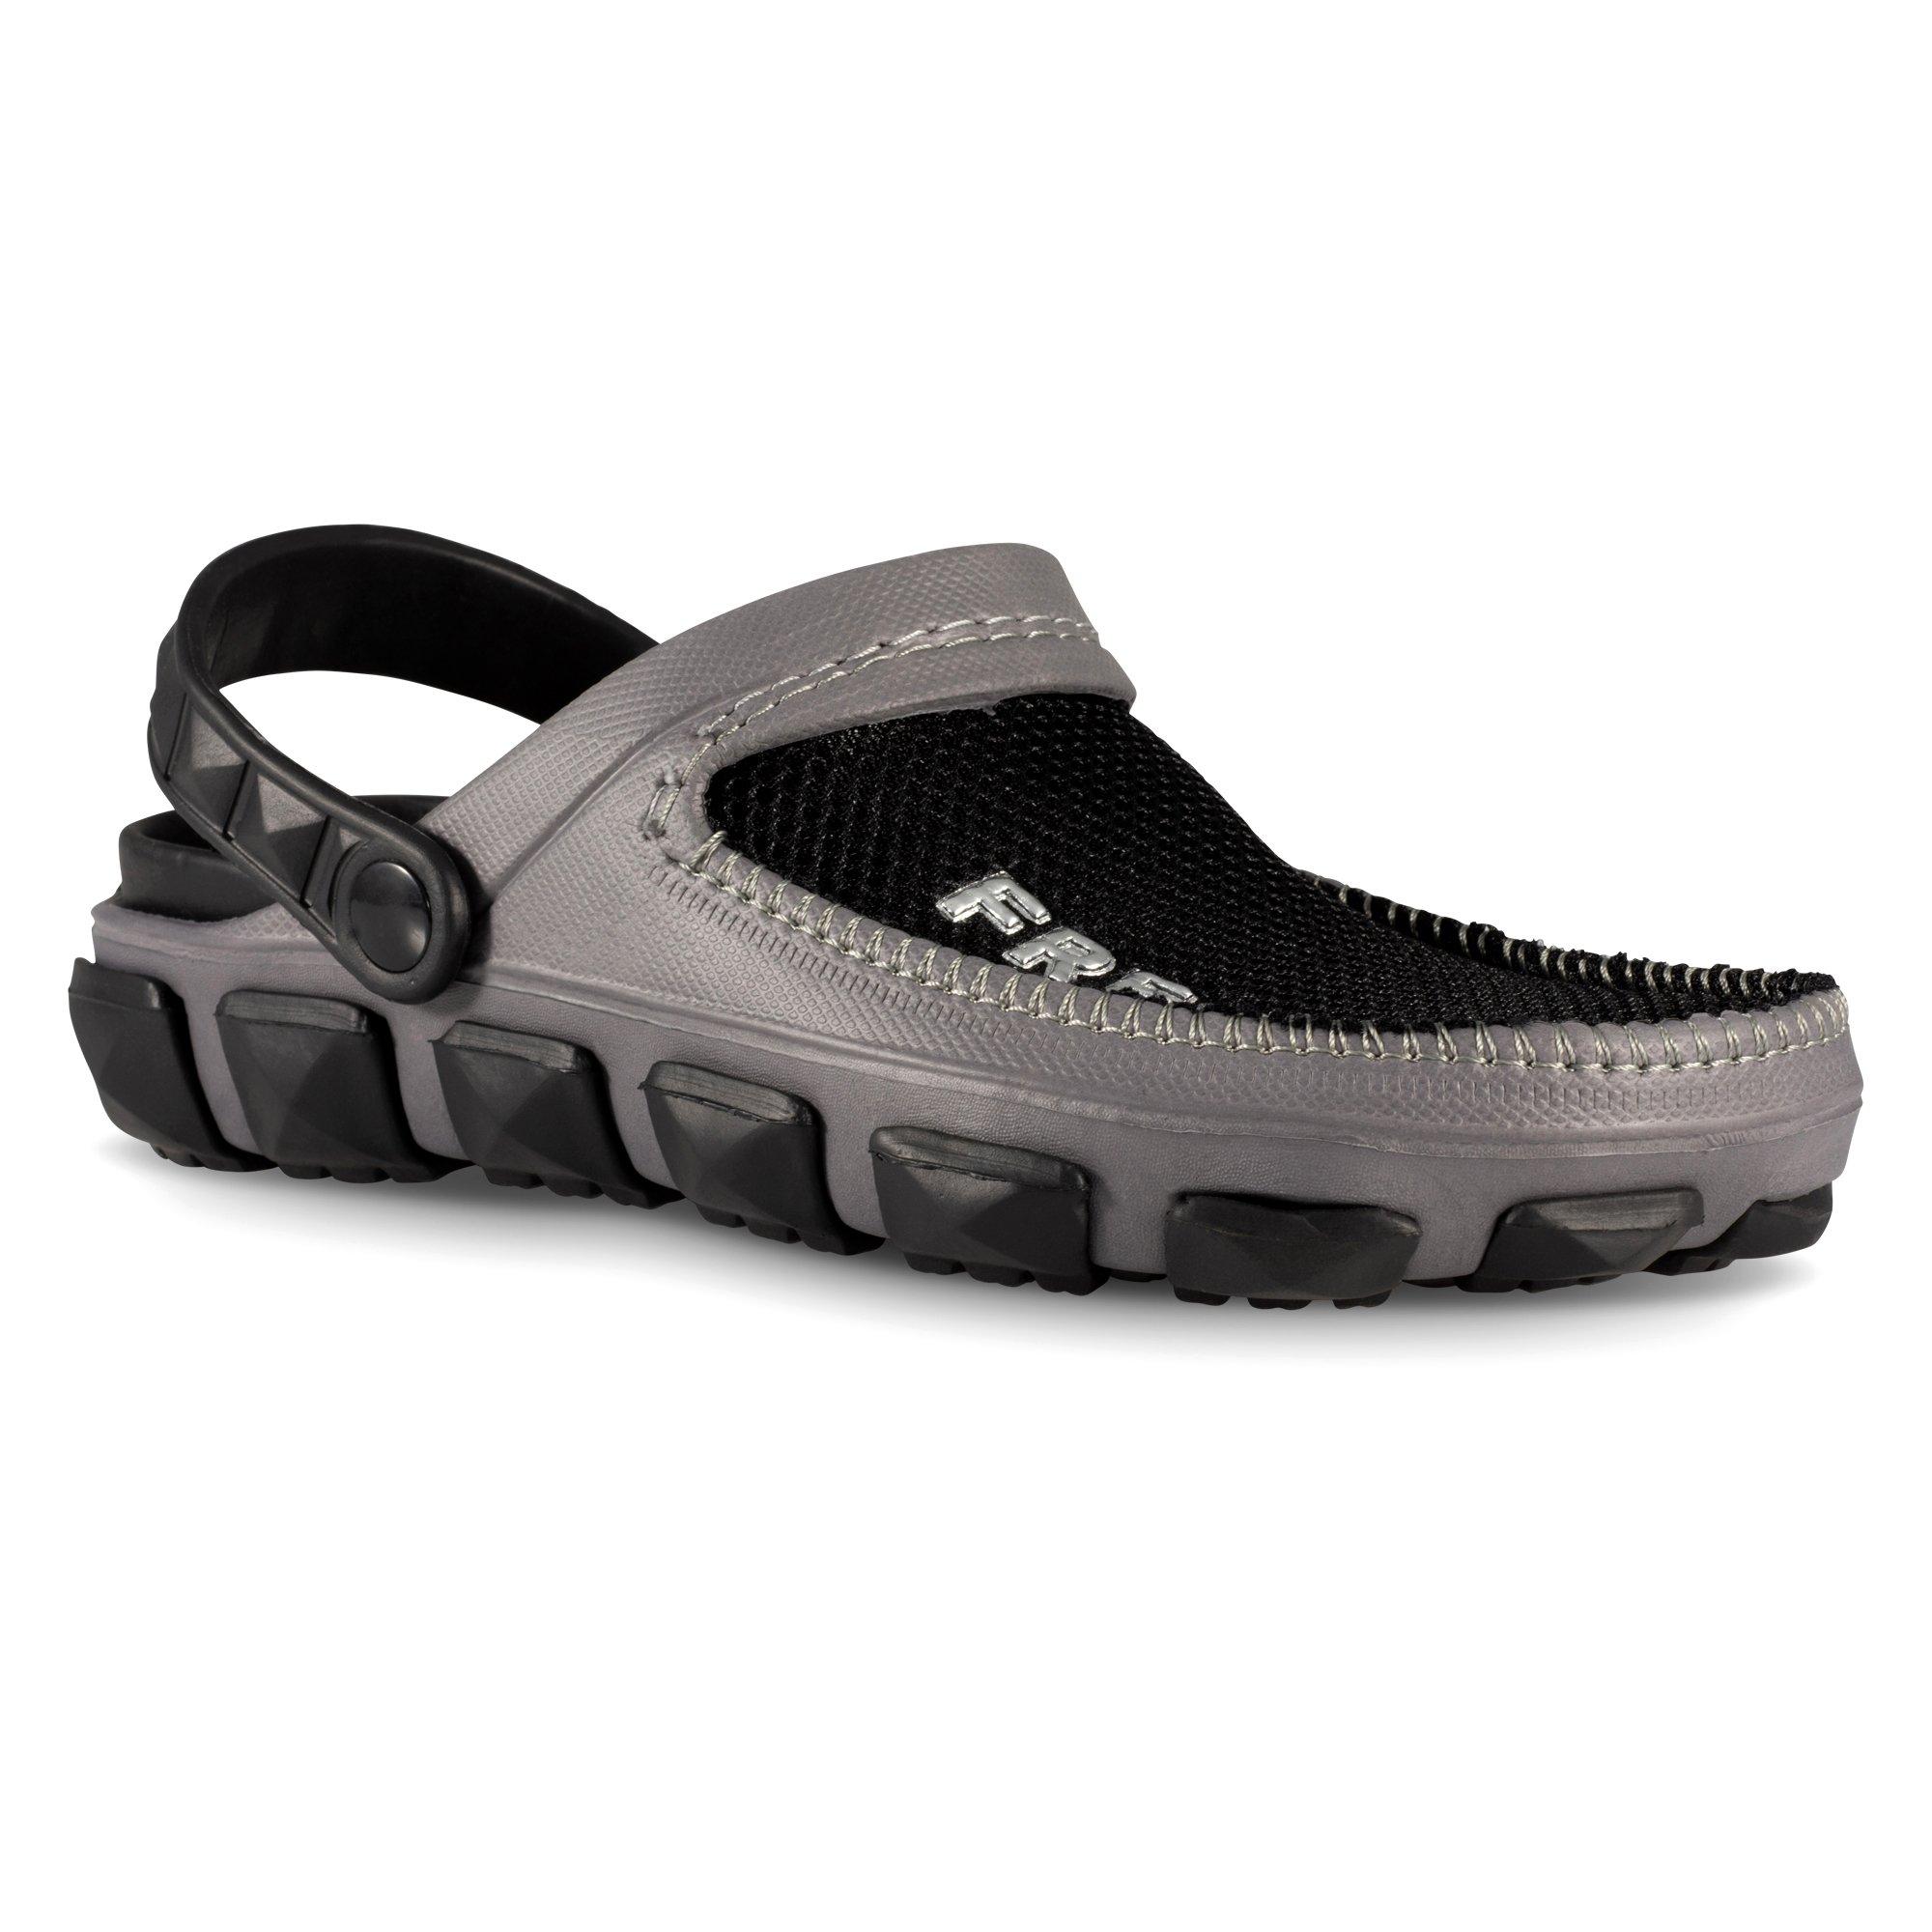 Fresko Shoes Men's Foam Clog Sandals – Water Shoe for Beach, Pool